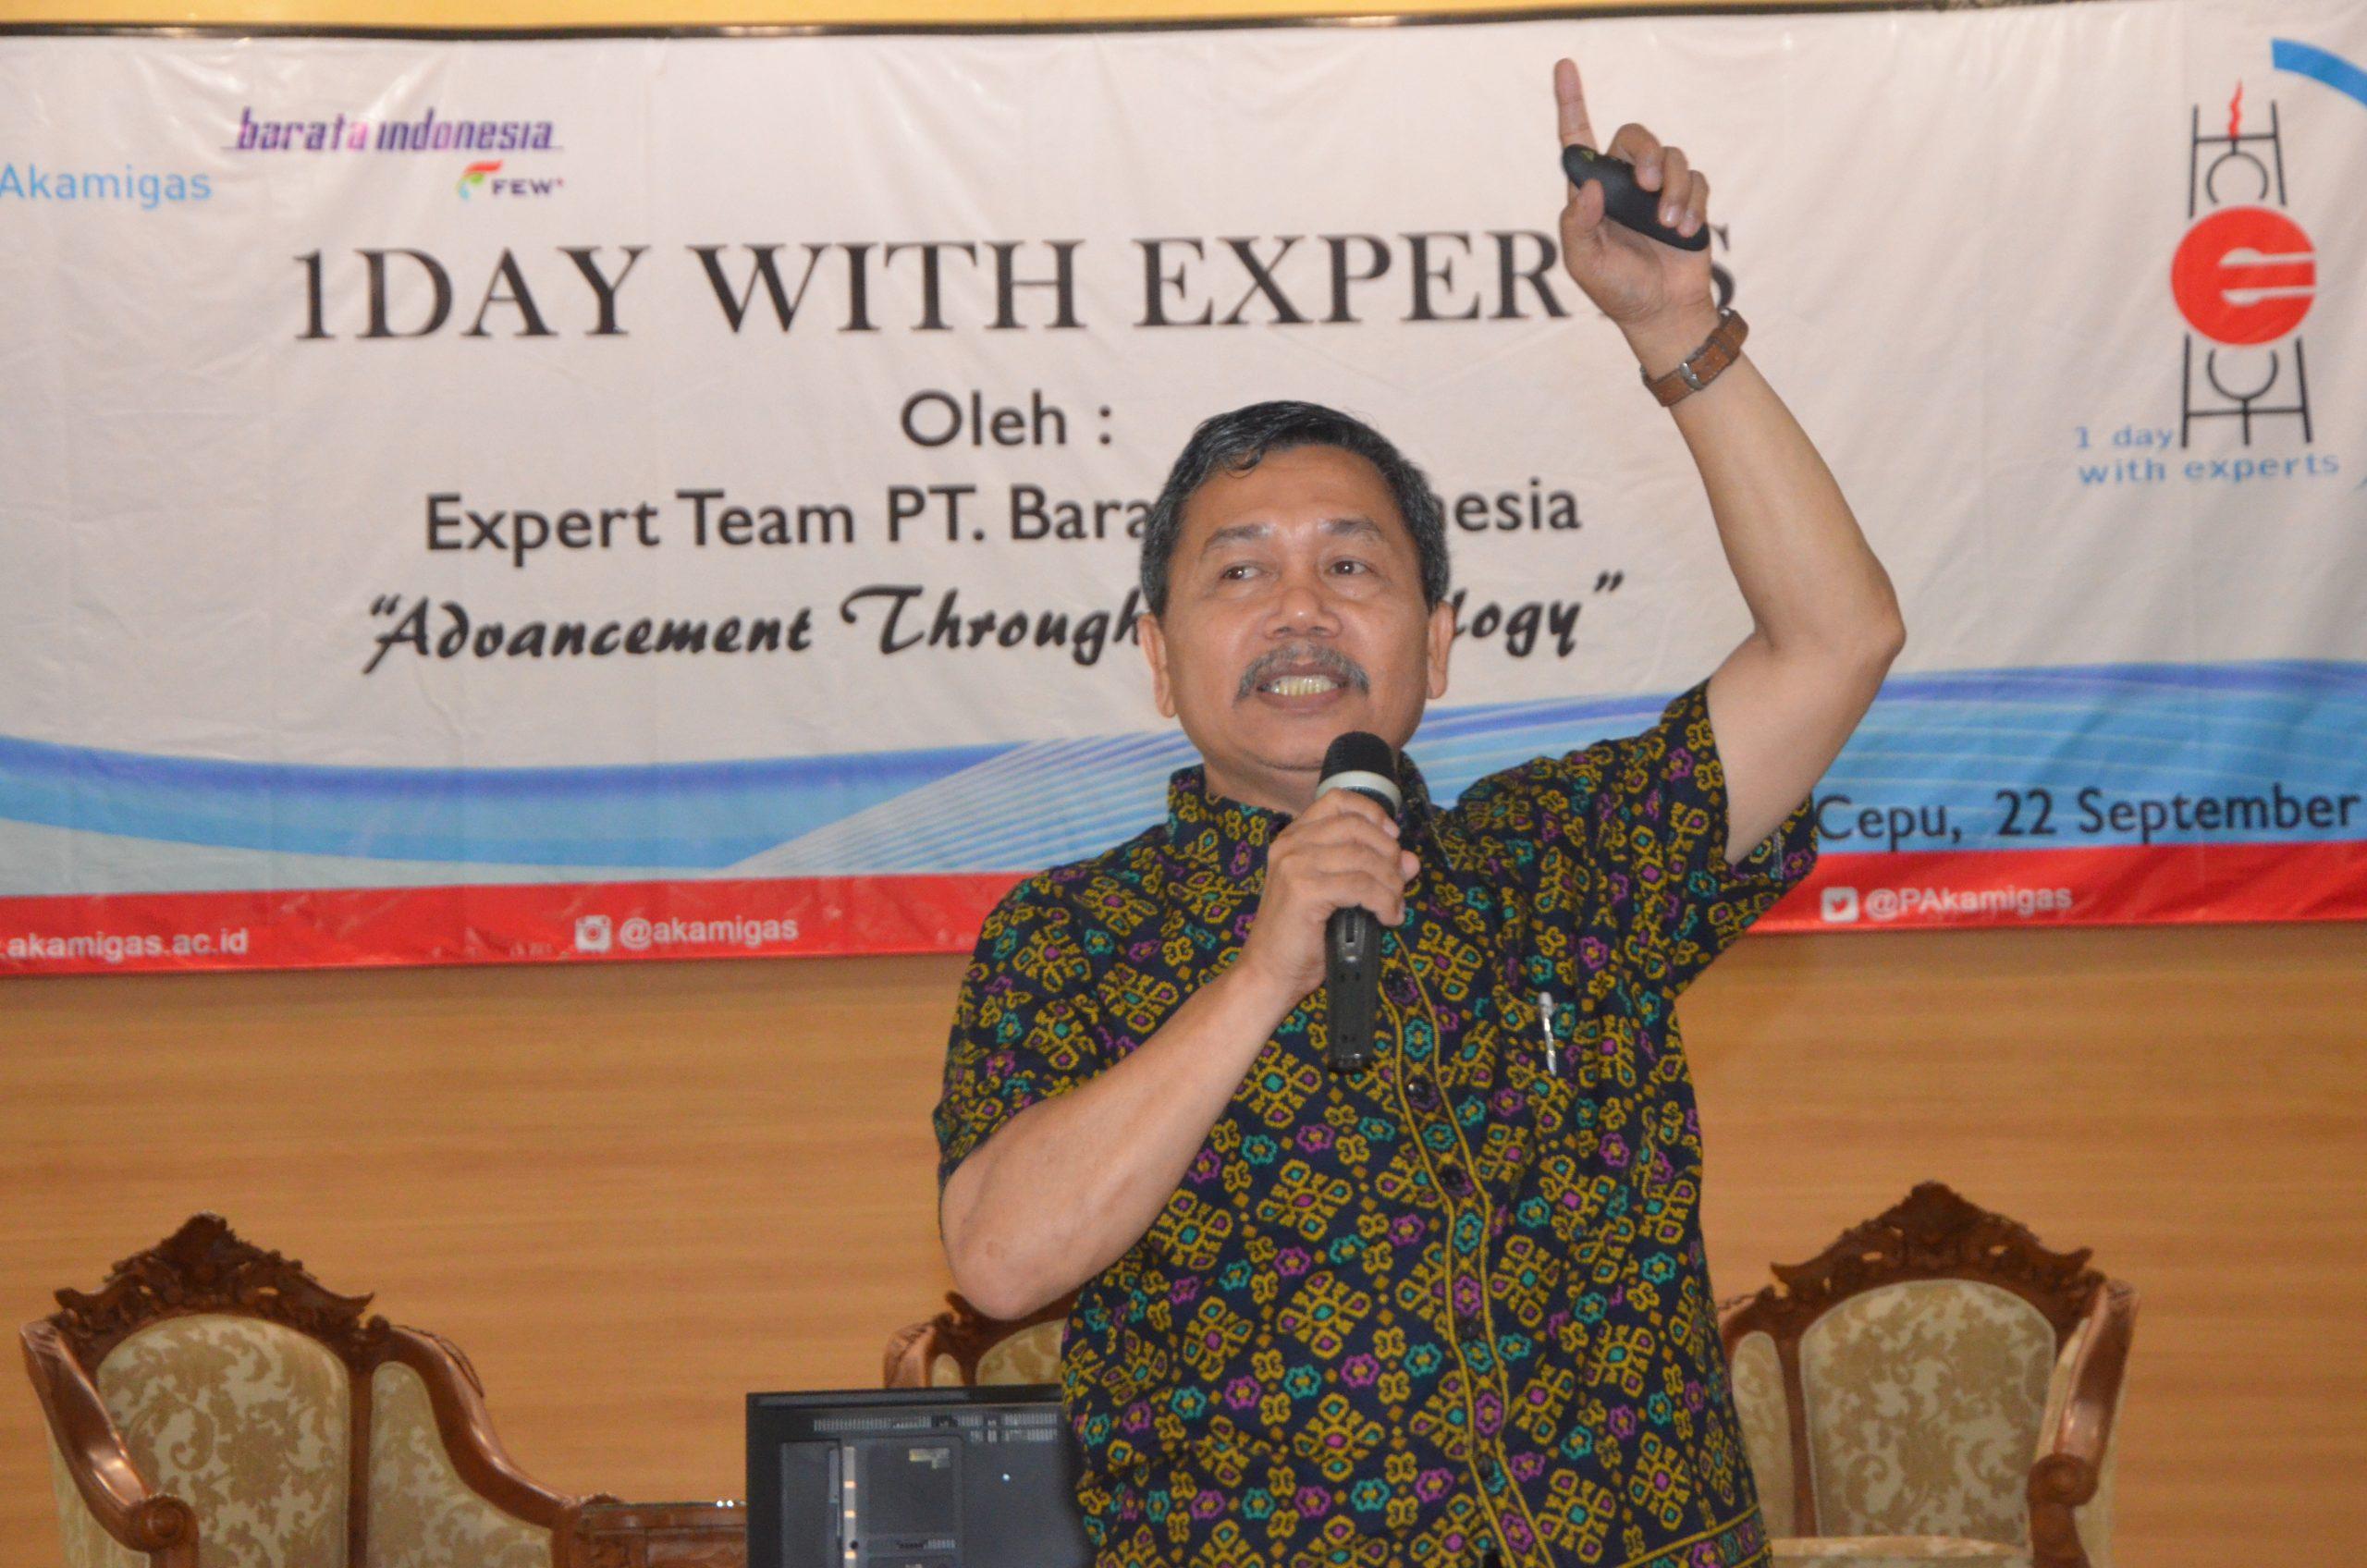 Kuliah Umum PT. Barata Indonesia, tgl 22 September 2018